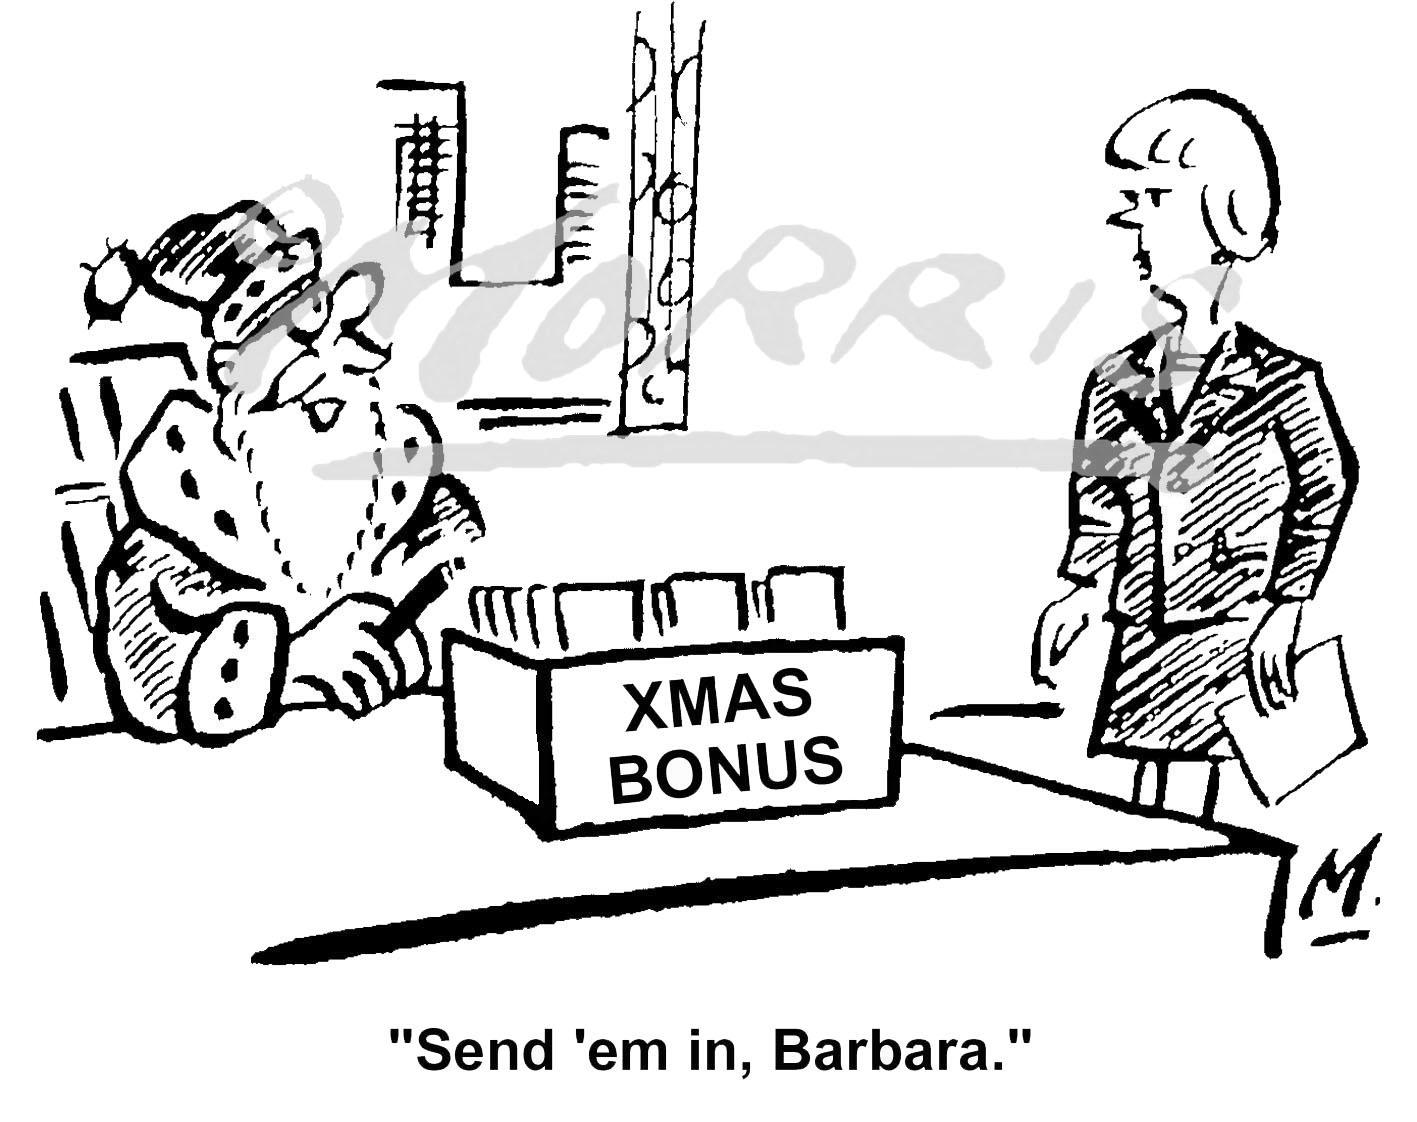 Christmas bonus comic cartoon – Ref: 4700bw